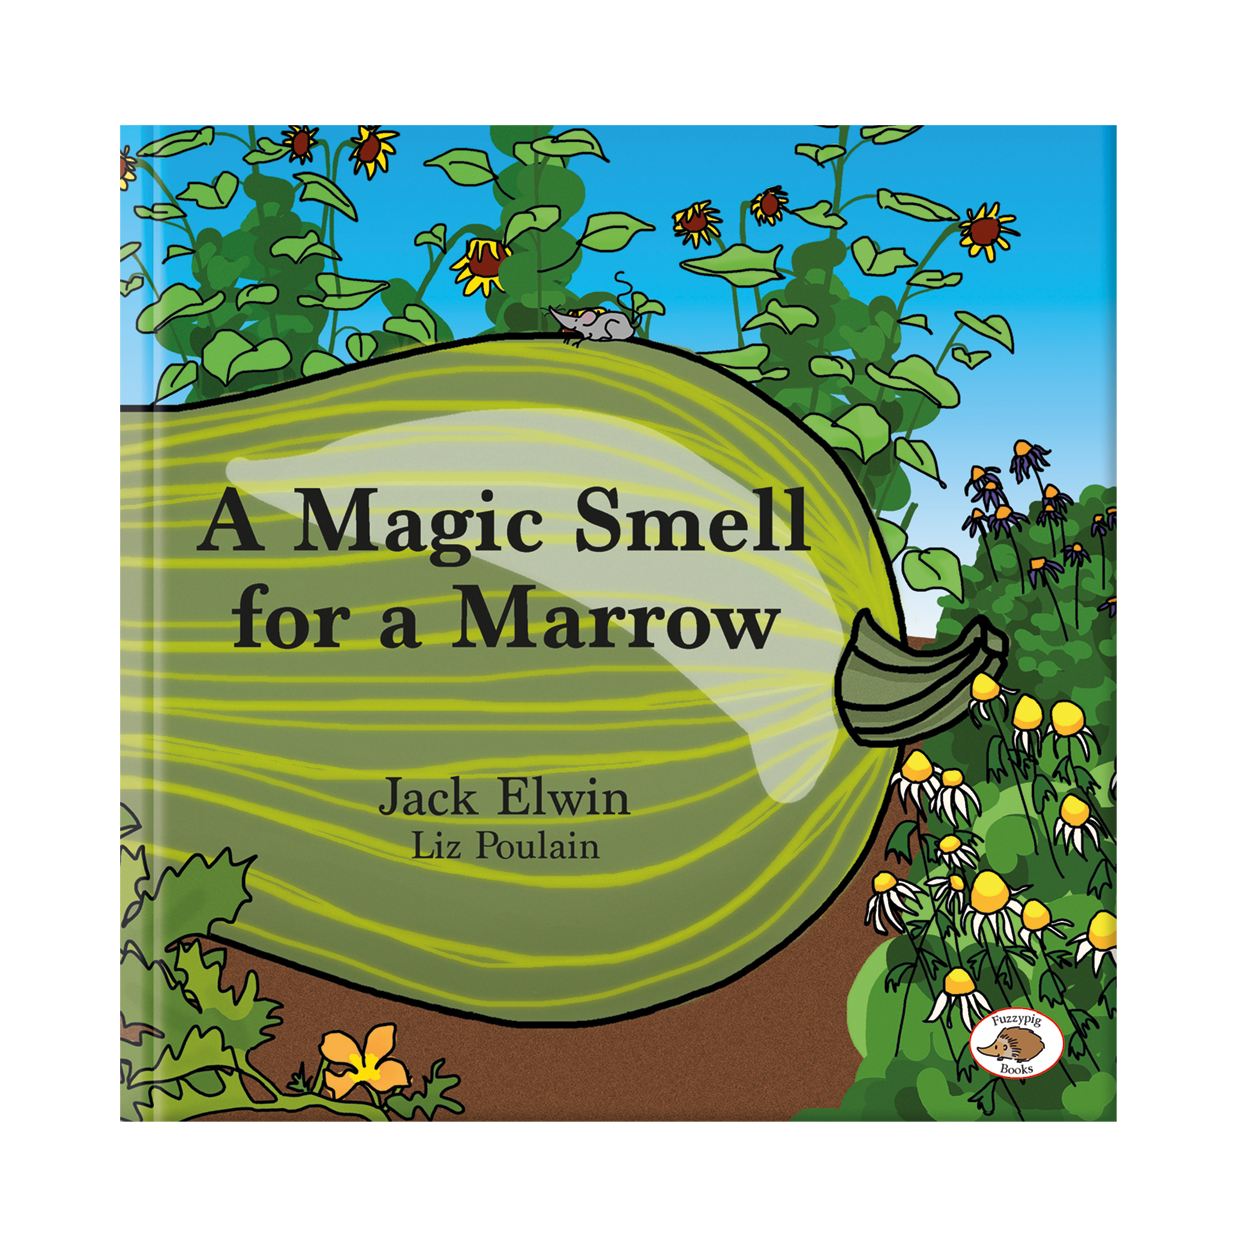 A Magic Smell for a Marrow